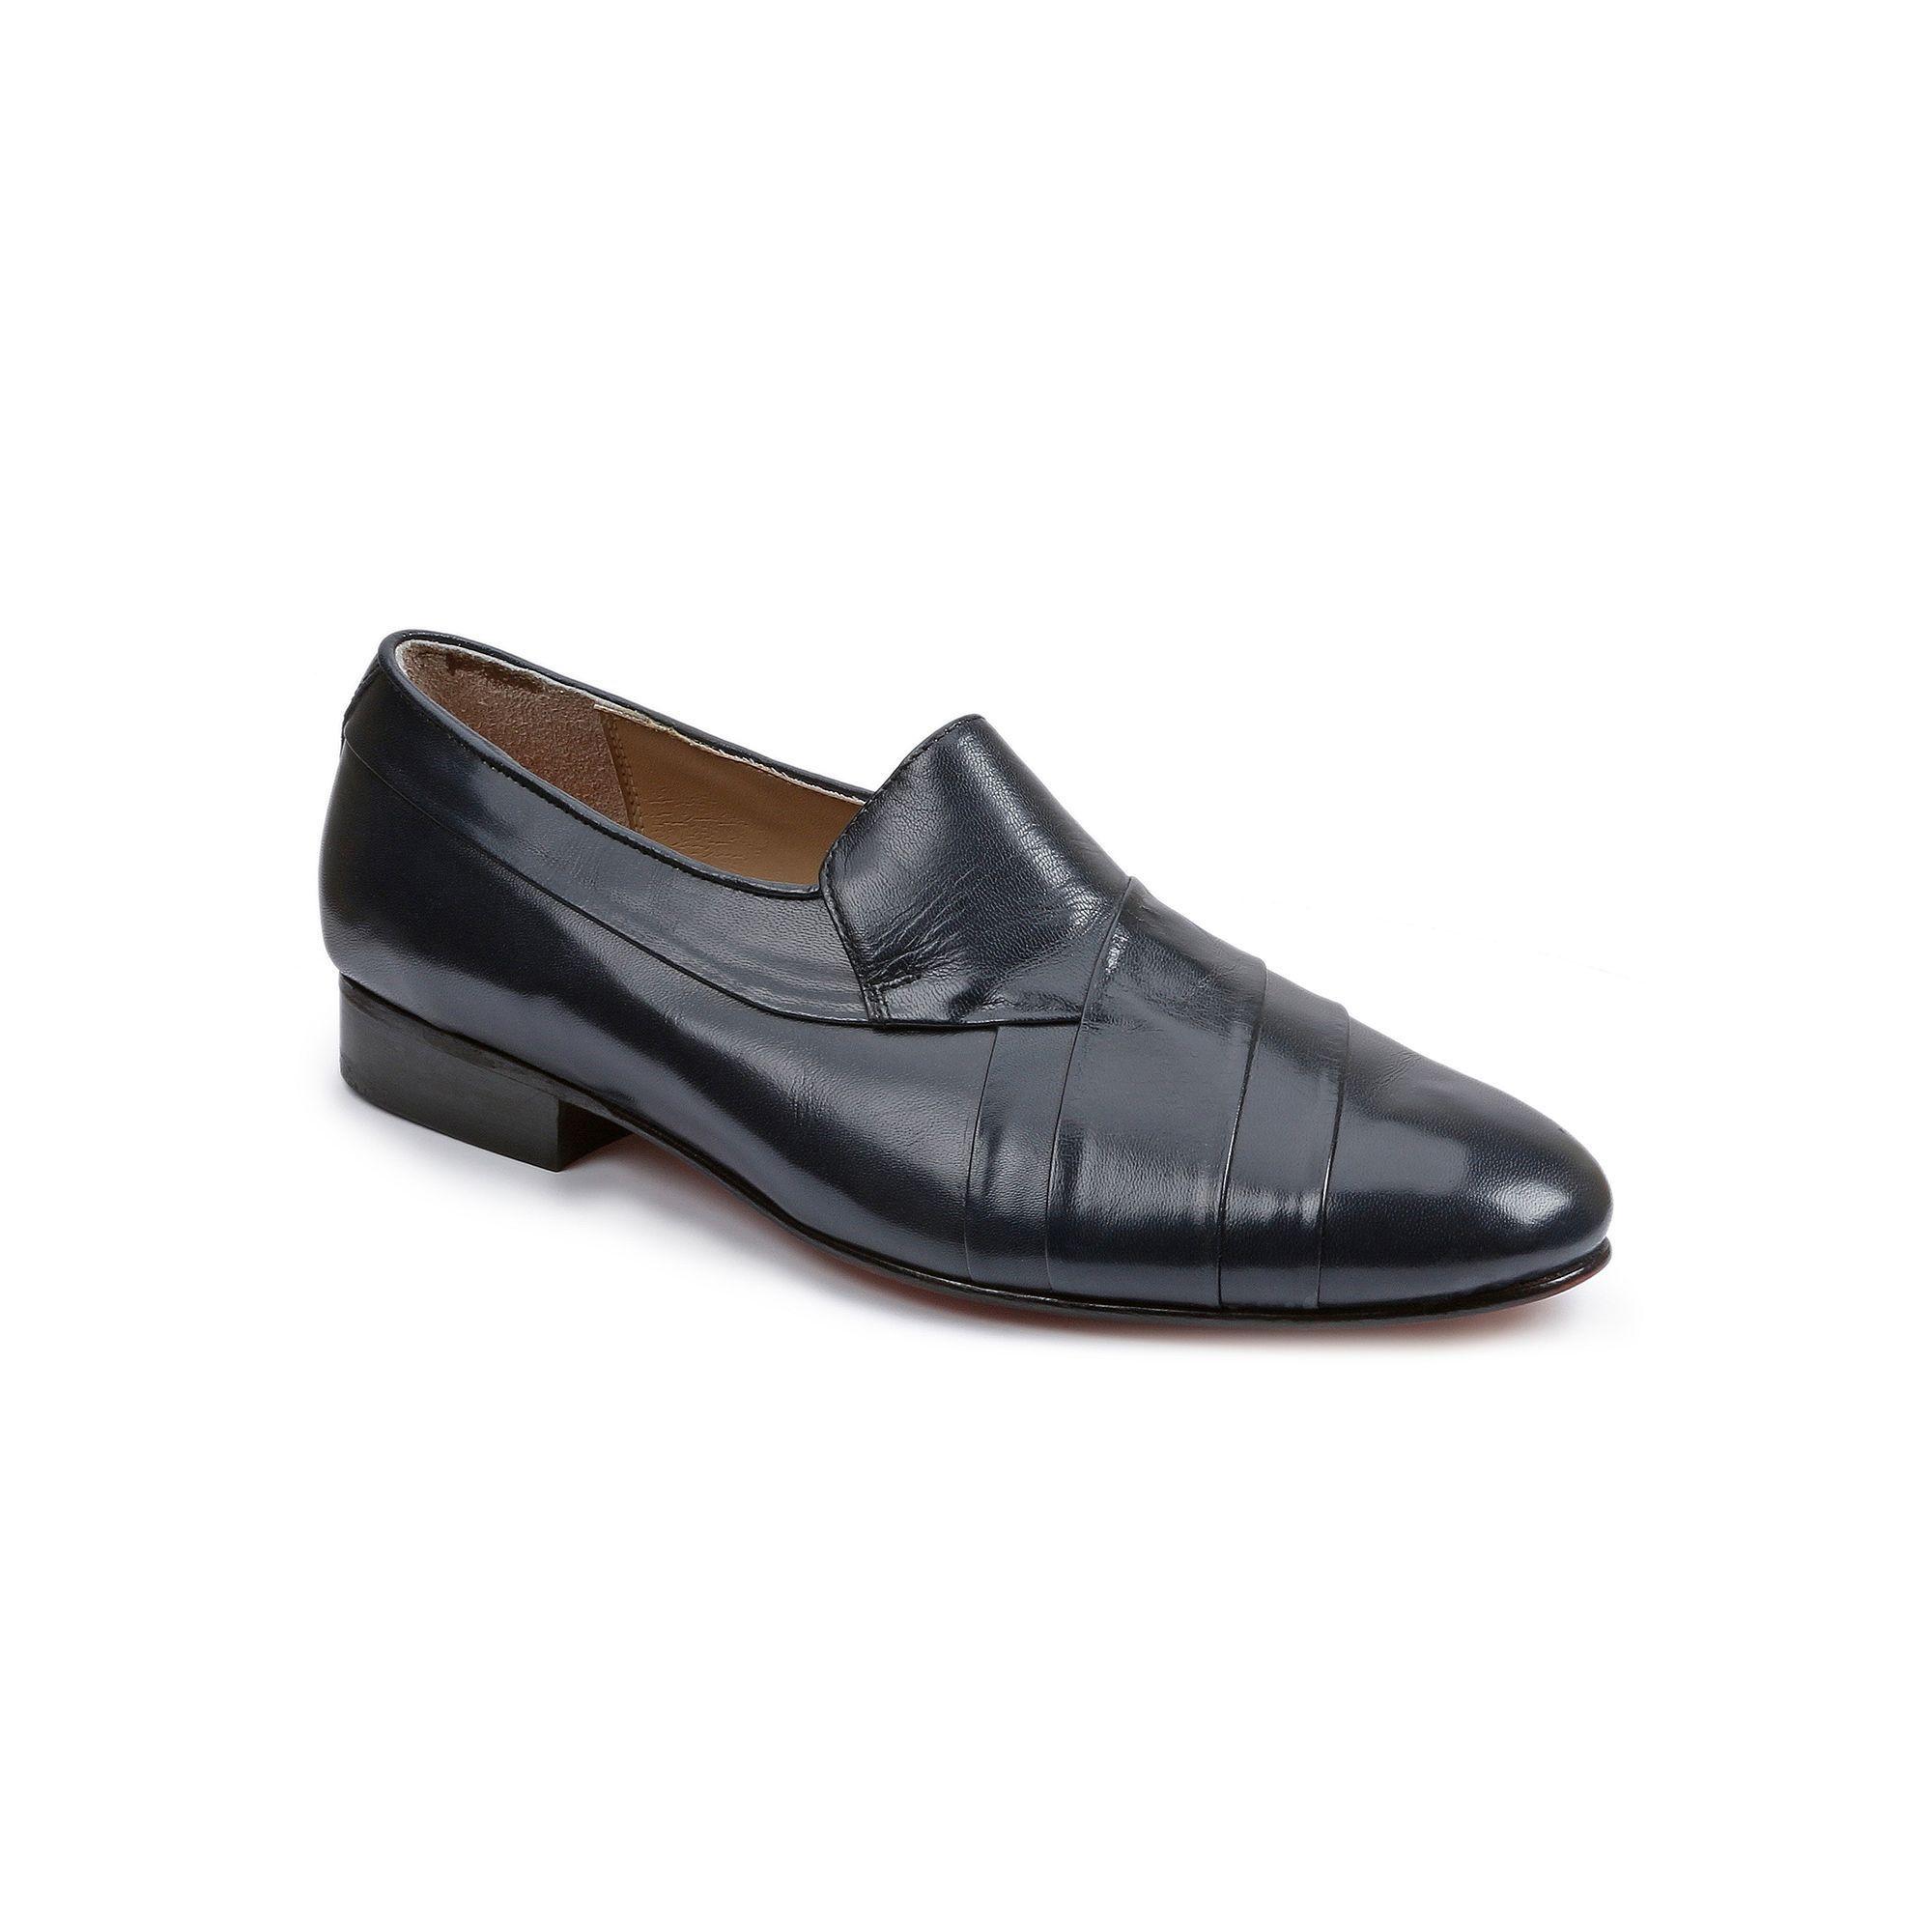 Charming Giorgio Brutini Mens Dress Loafers